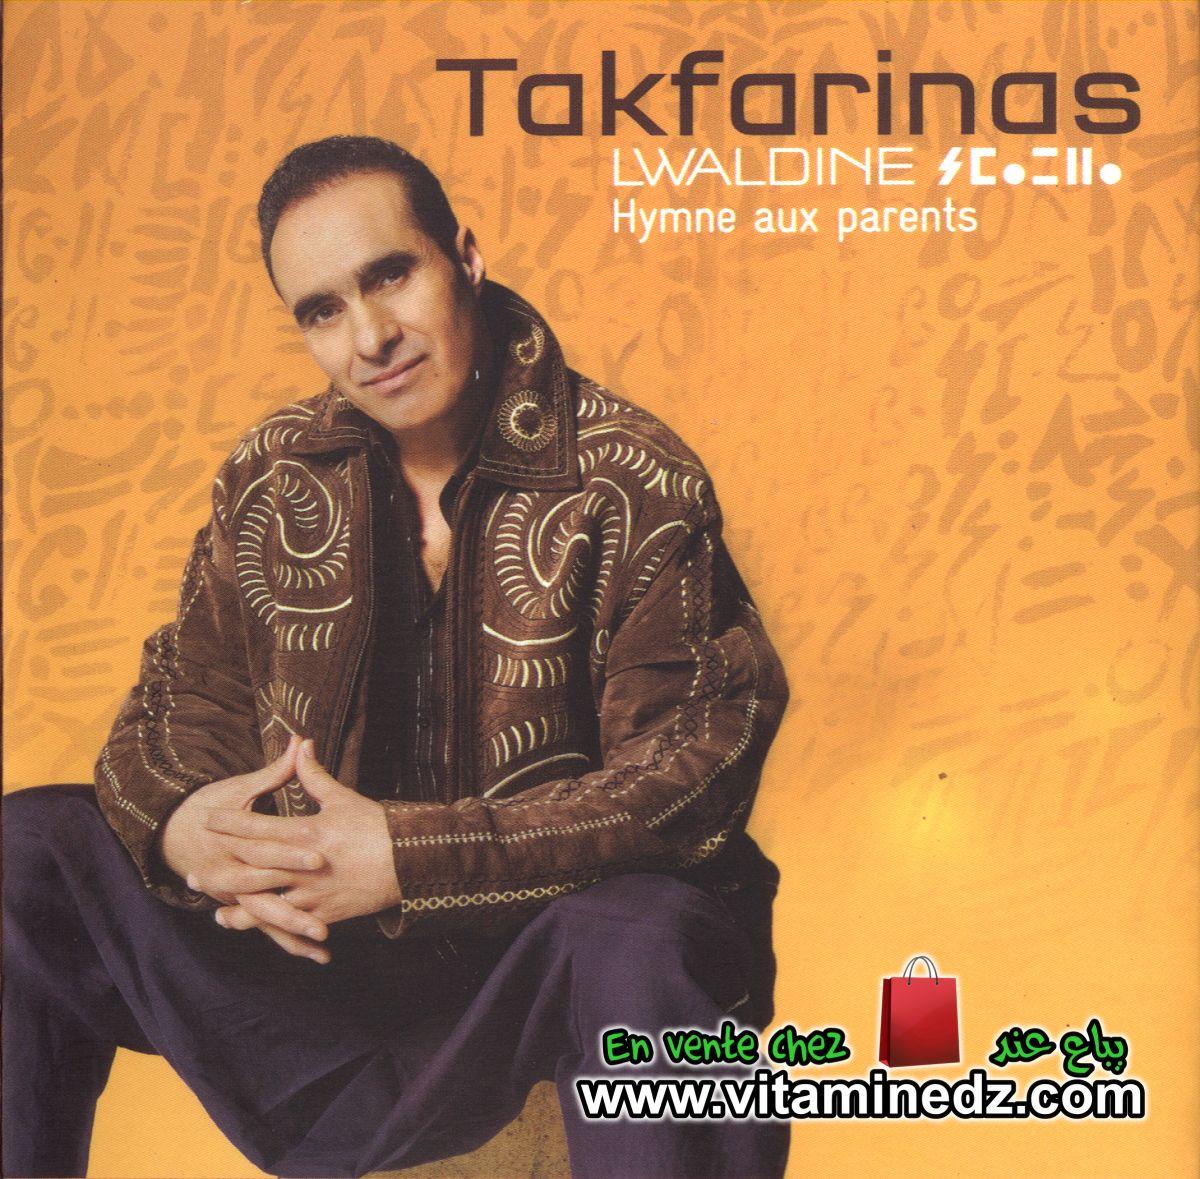 Lwaldine (Hymne aux parents) - Takfarinas